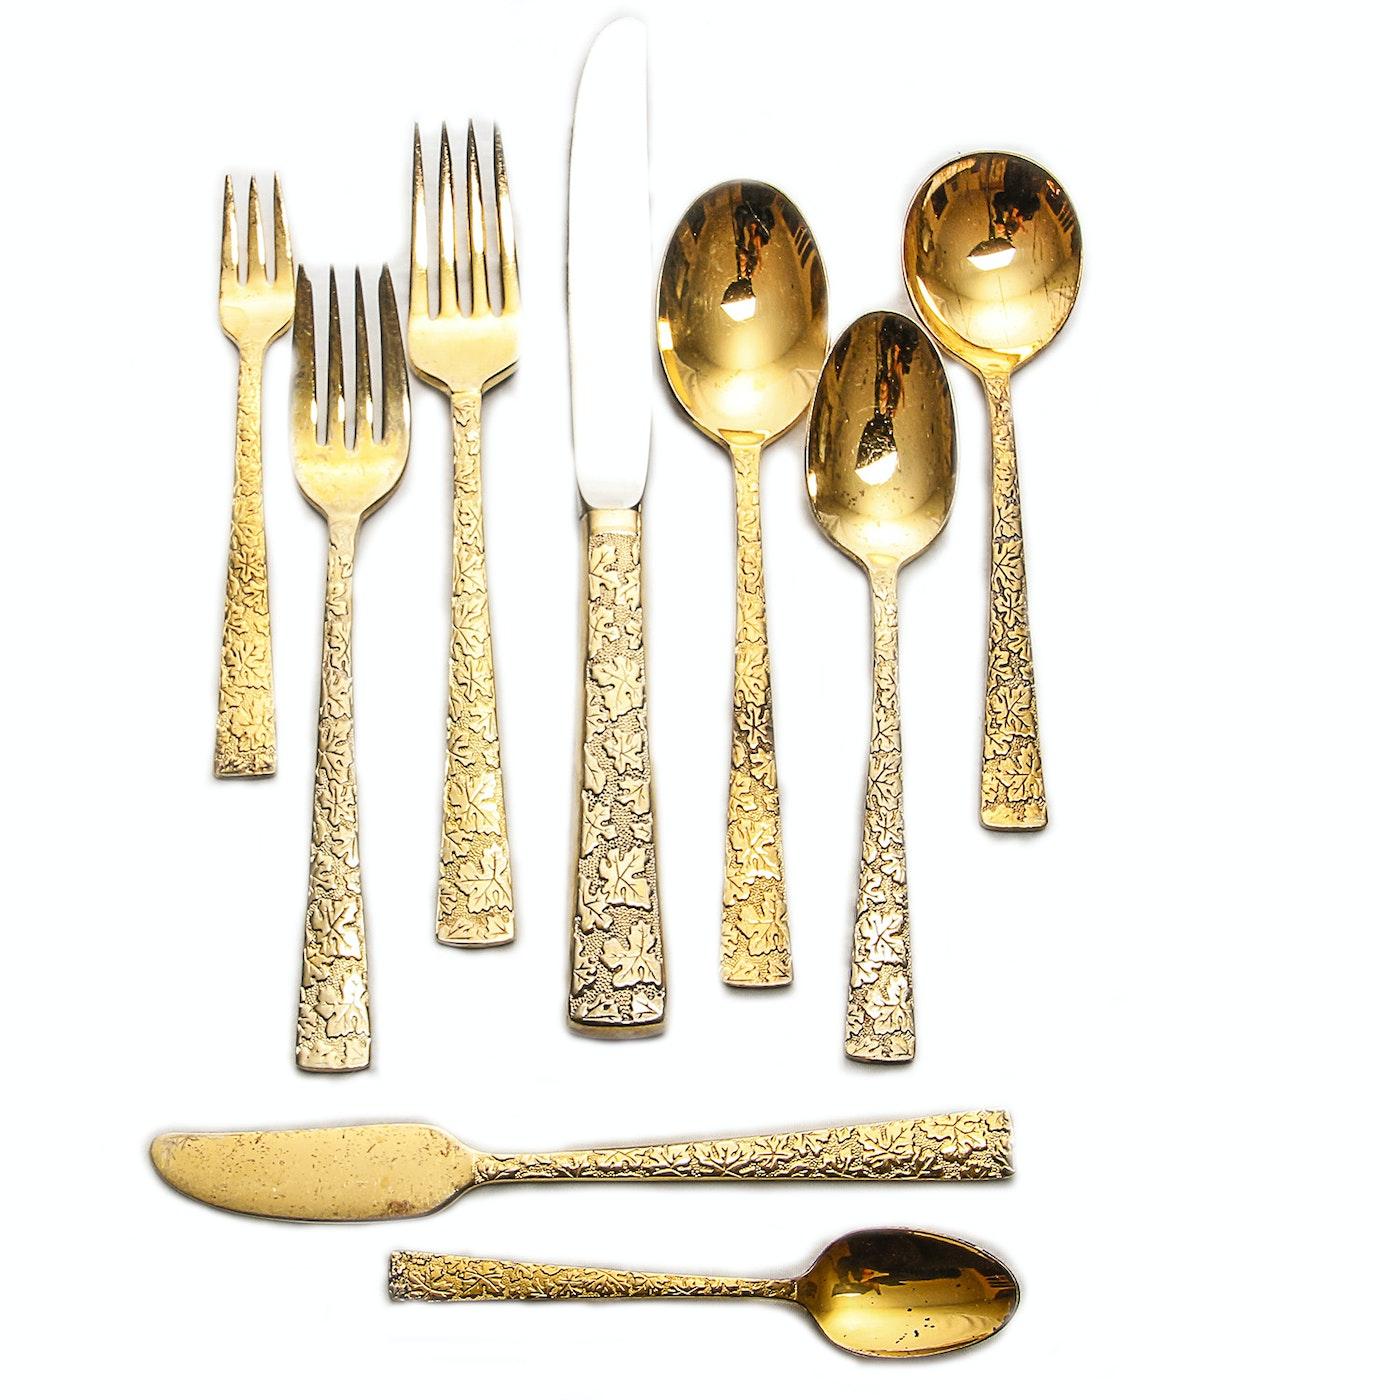 International Silver Co Gold Toned Flatware Set Ebth